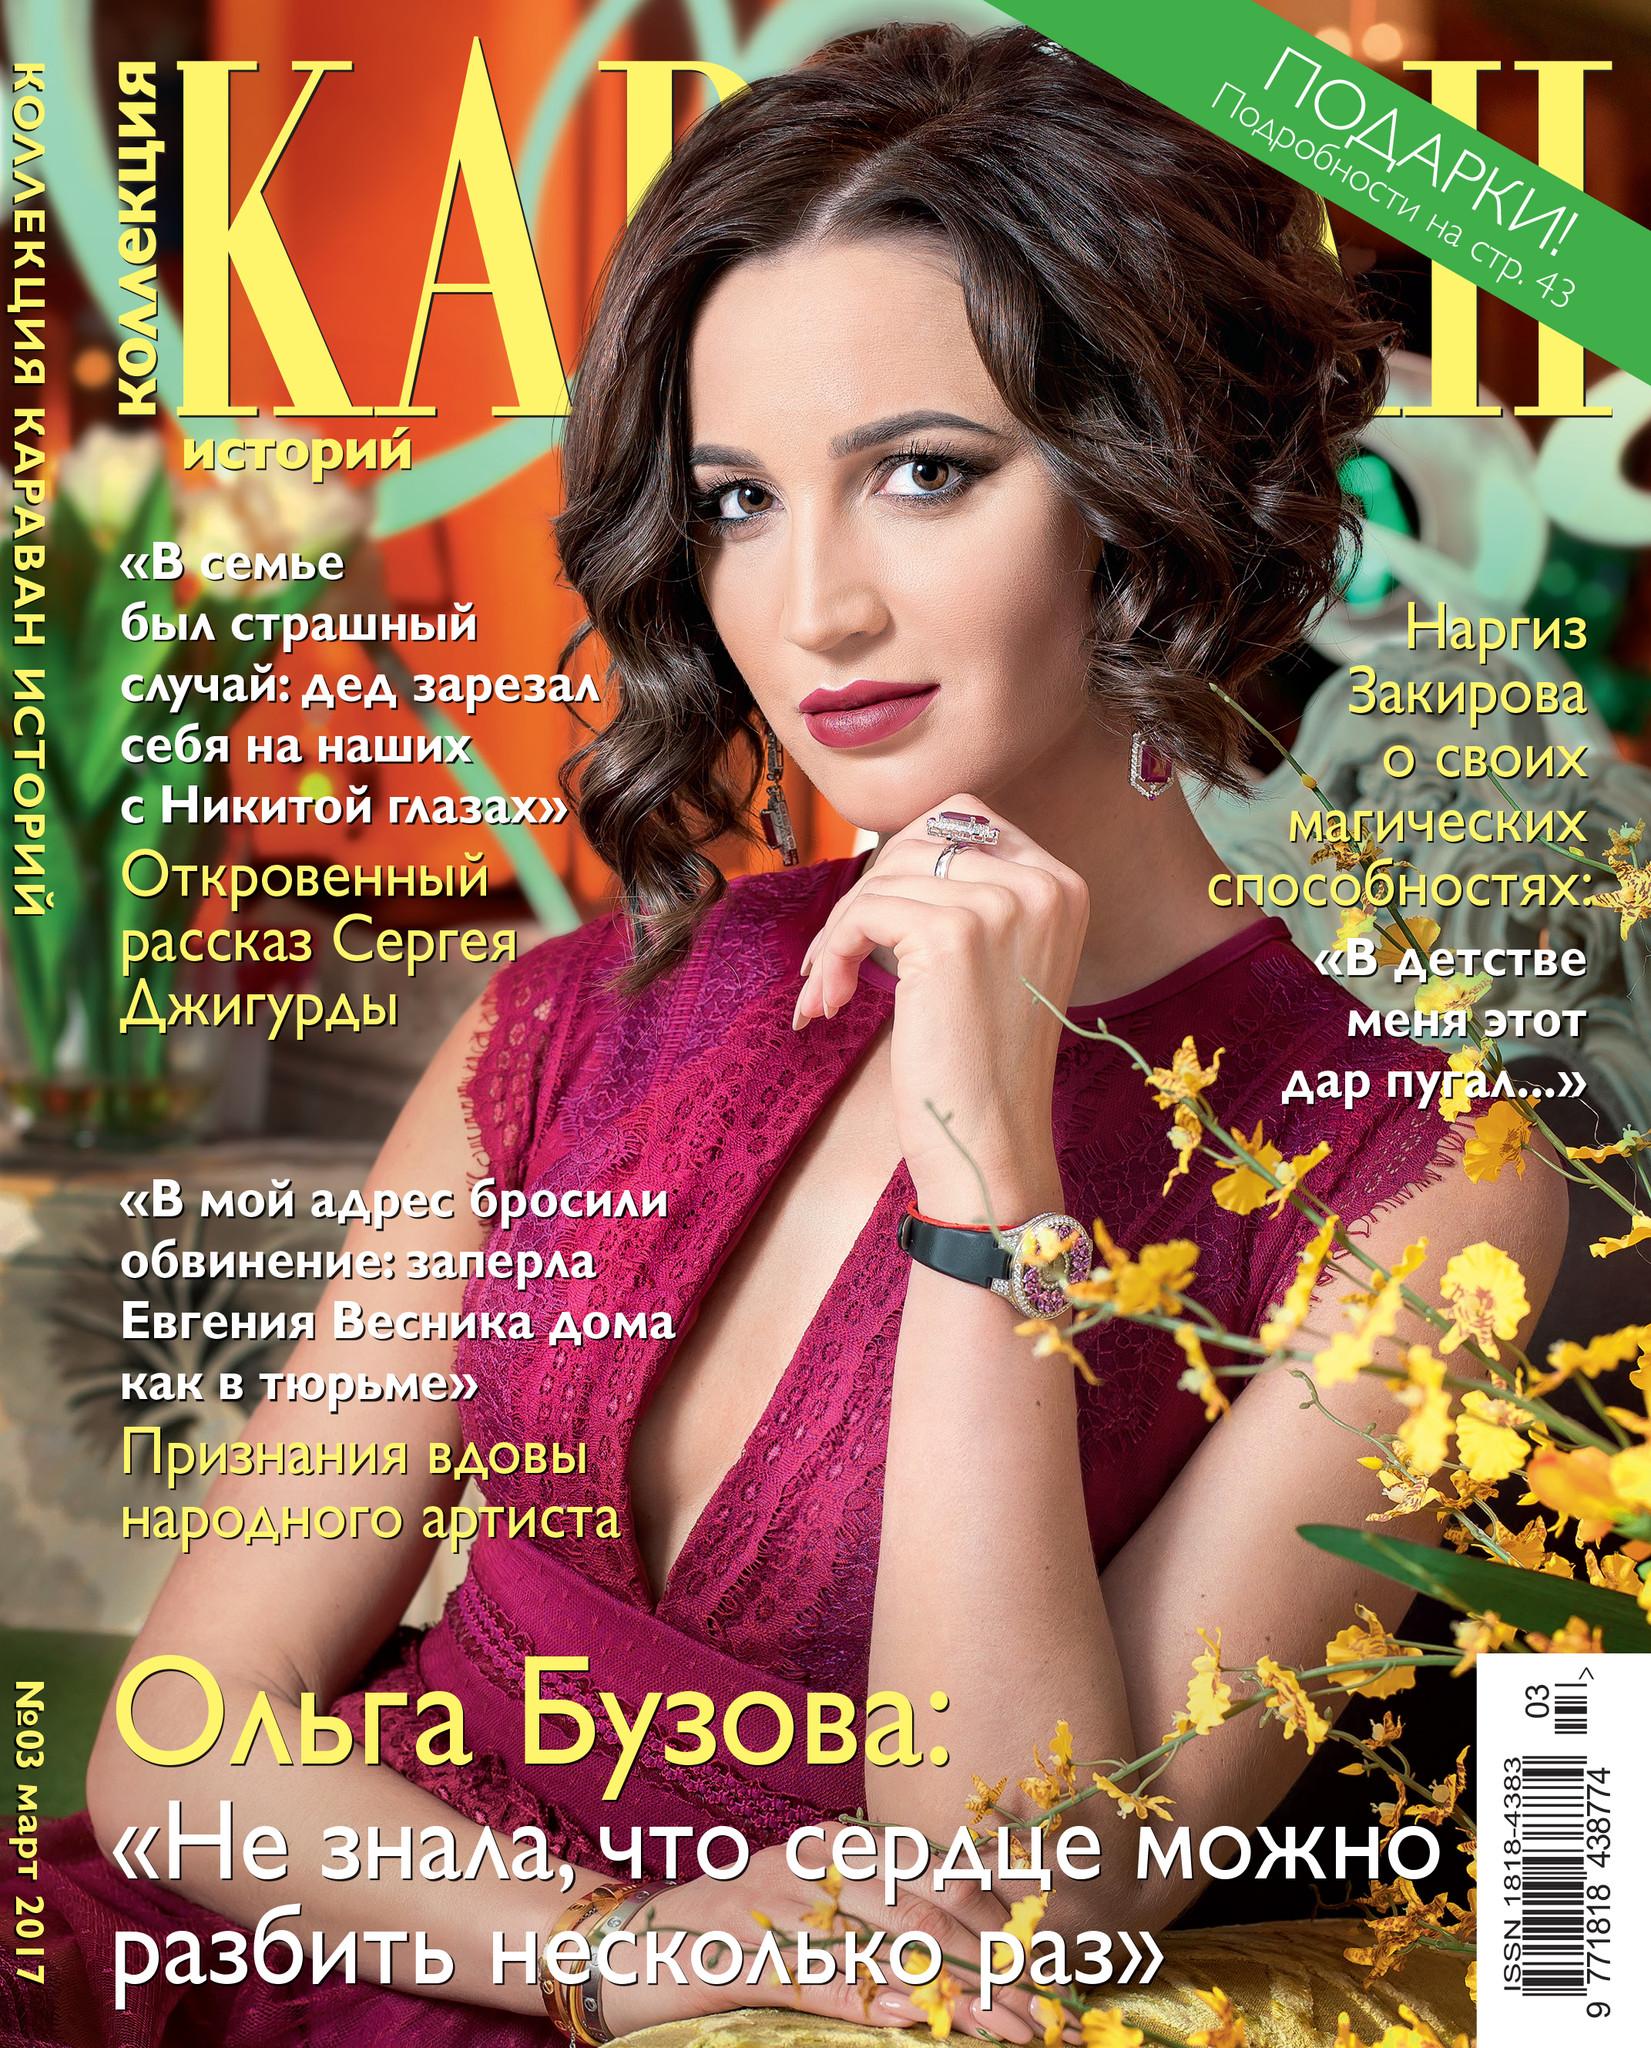 Ольга Бузова Разбитое сердце стр13  7Днейру